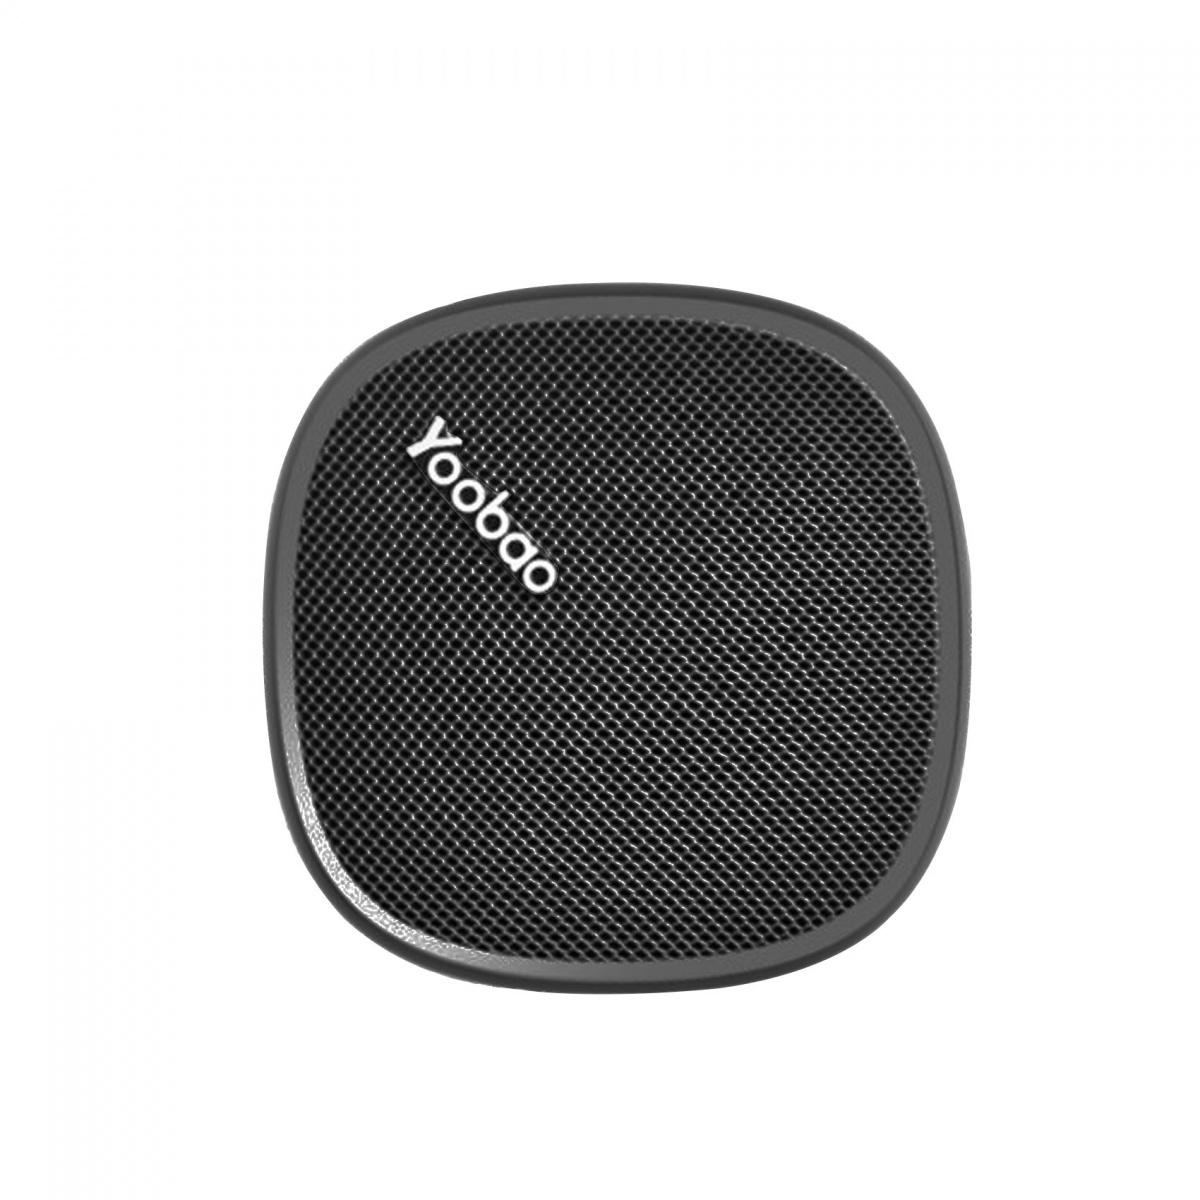 Yoobao M1 Portable Bluetooth Speaker - Black